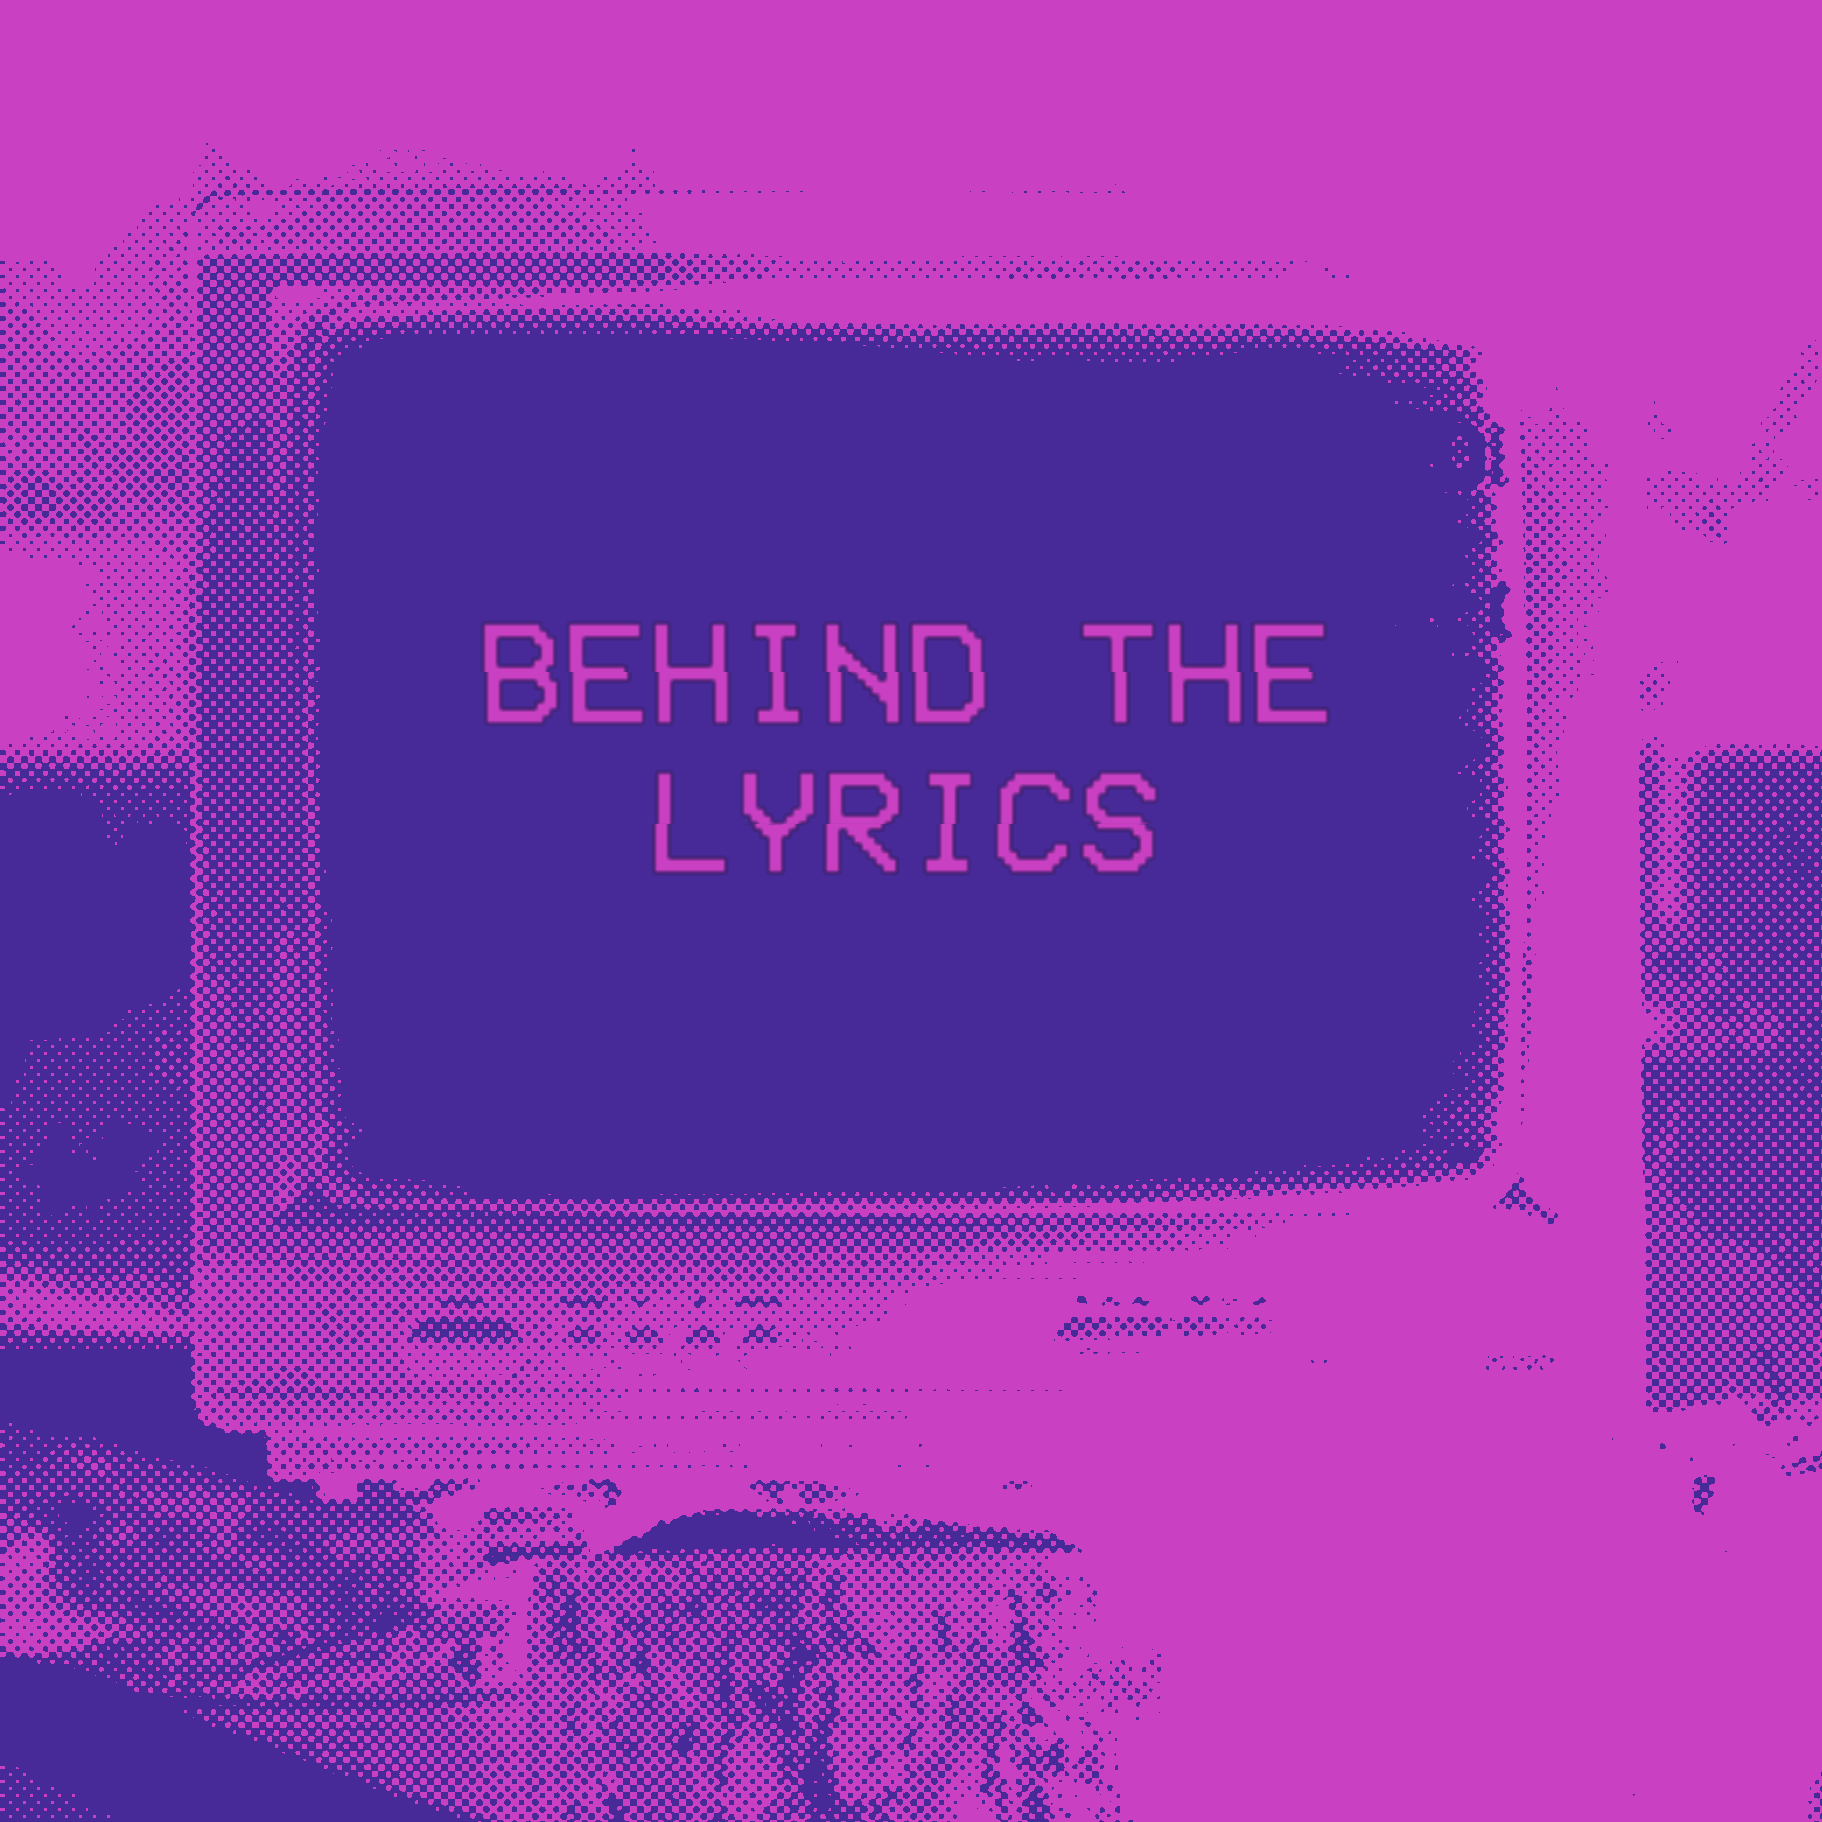 Behind the Lyrics.jpg